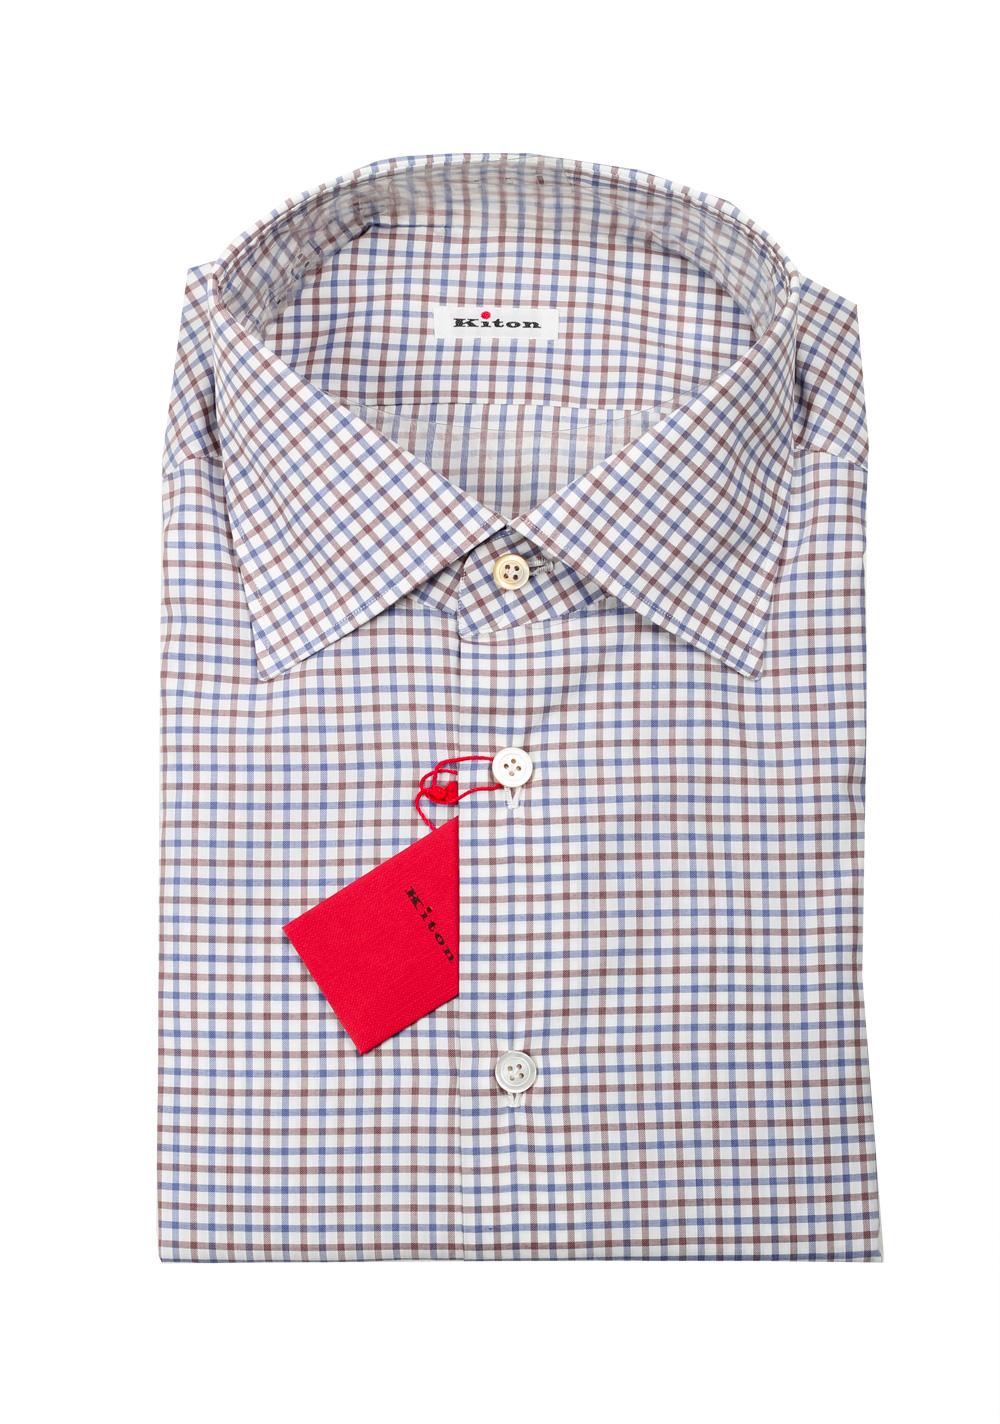 Kiton Checked White Blue Brown Shirt 45 / 18 U.S.   Costume Limité